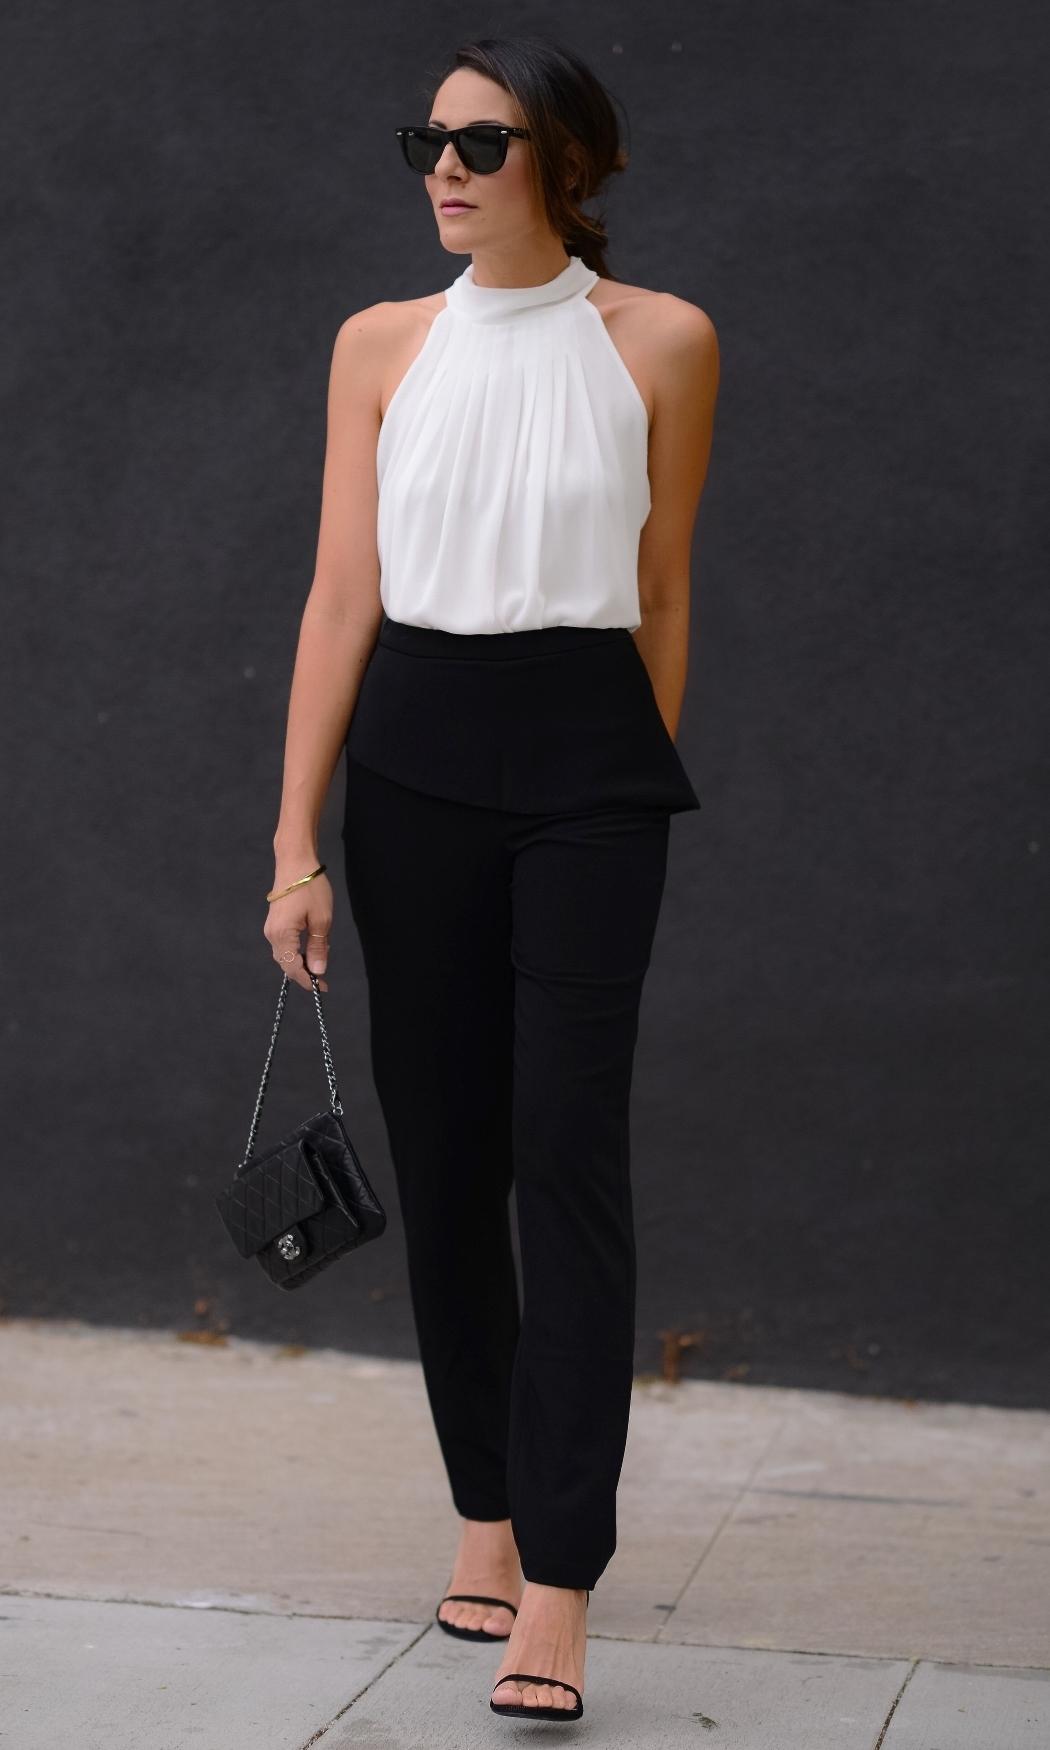 ParisandMeBoutique_Coronado_SanDiego_Fashion_LucysWhims_Stylestalker_HolidayInspo_Streetstyle.jpg